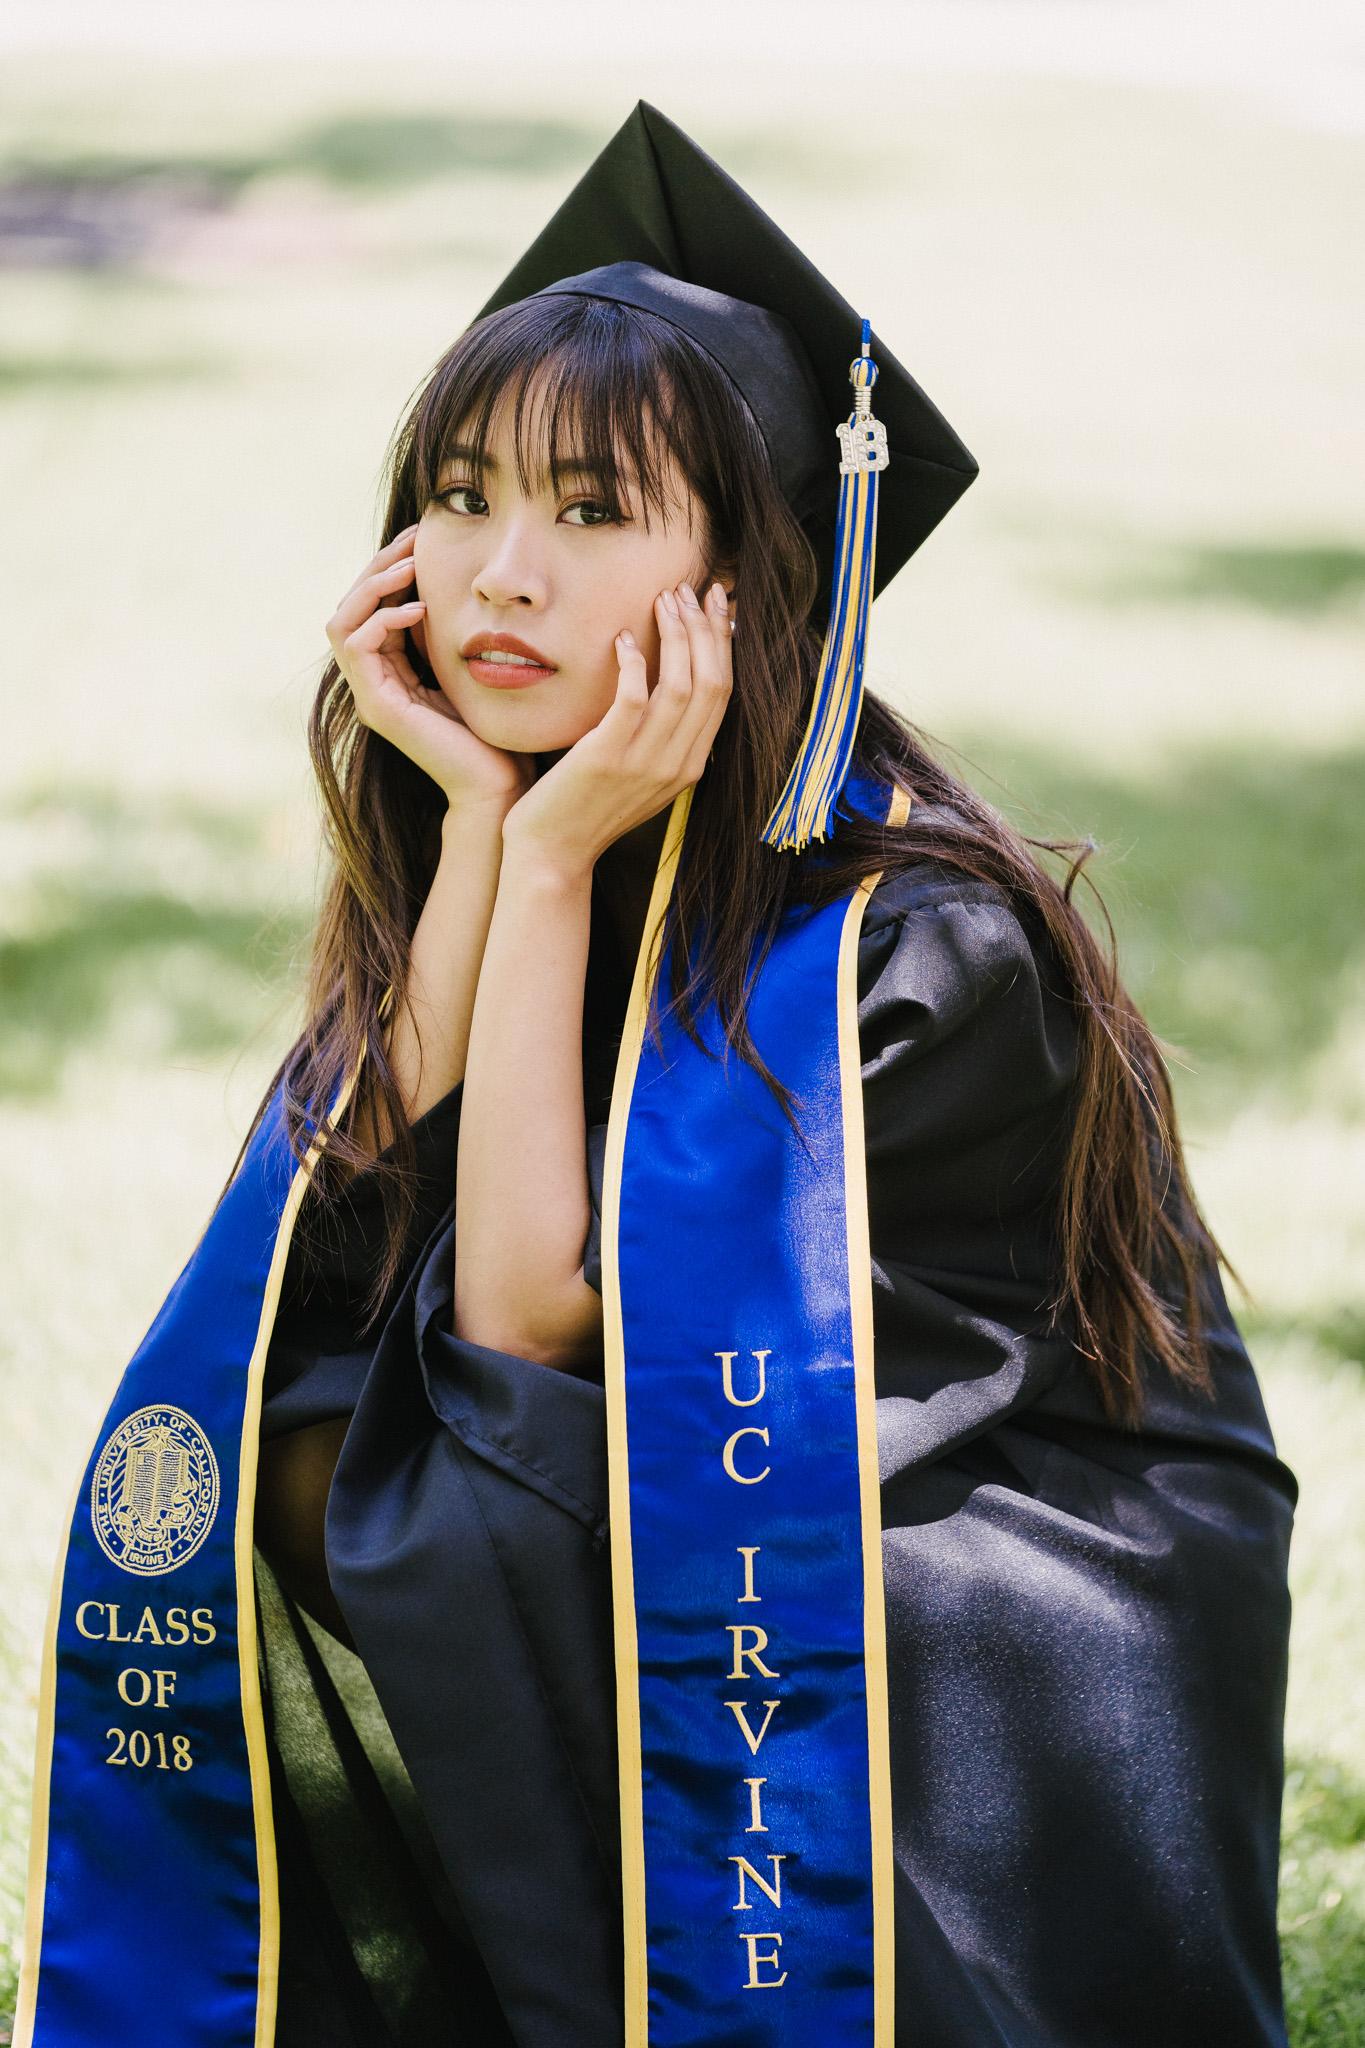 [5-16-2018] Vi's Graduation Photoshoot179.jpg